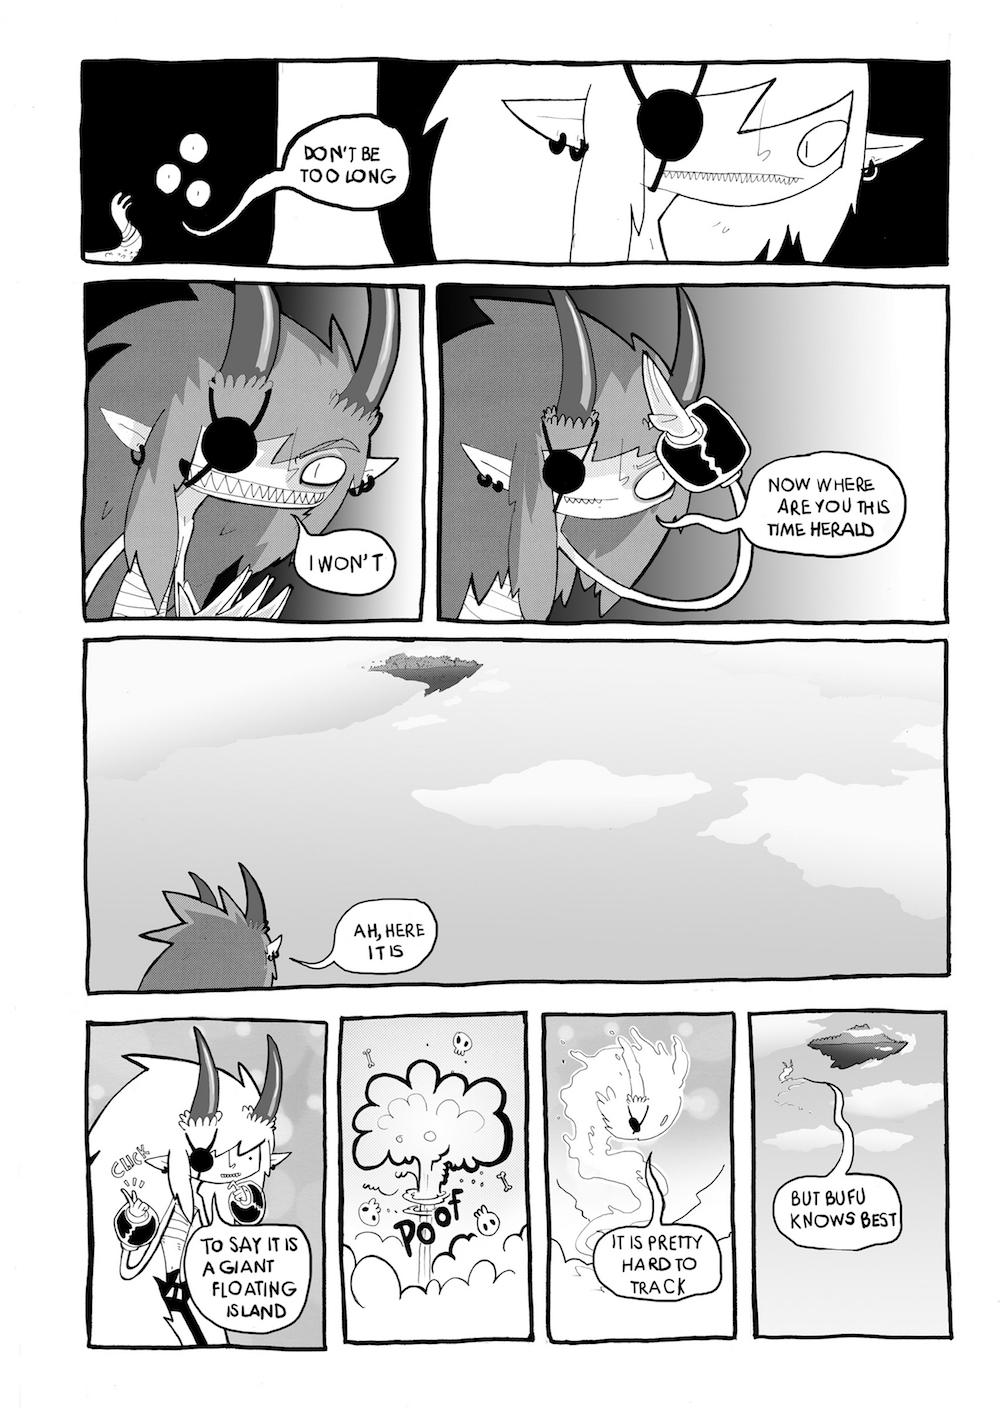 herald owlett vol 1 page 5 copy.jpg